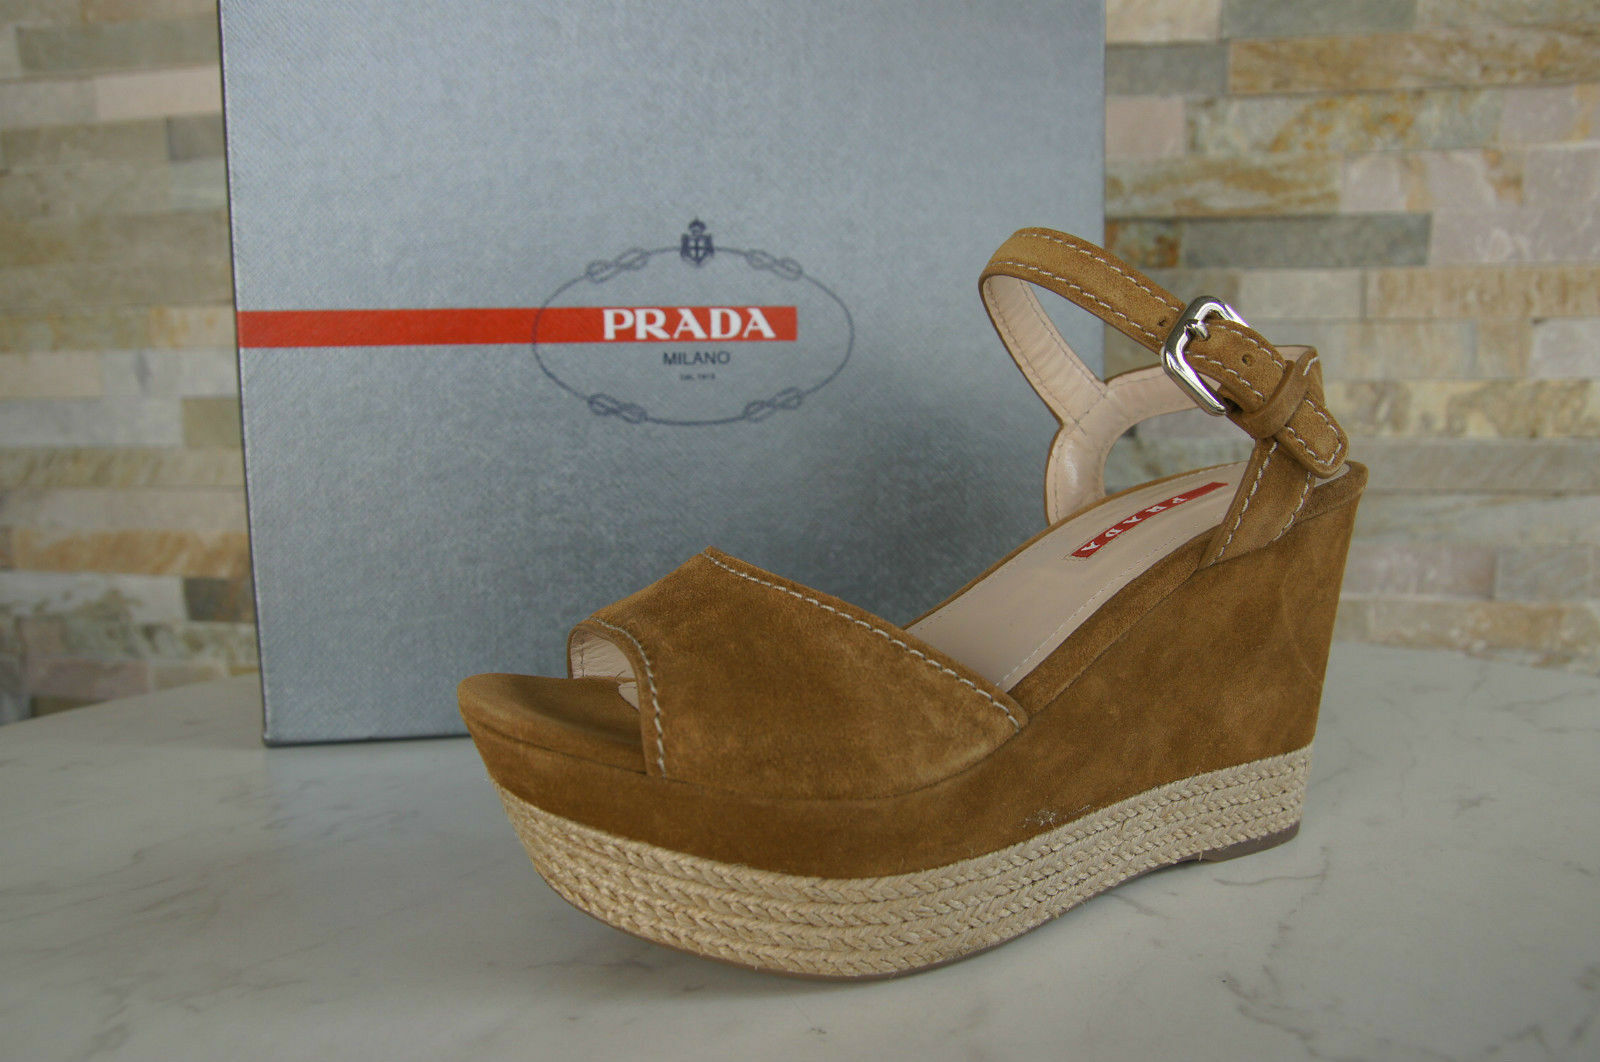 PRADA Dimensione 40,5 Piattaforma Sandals scarpe Wedges Sisal Caramell NUOVO   vendita scontata